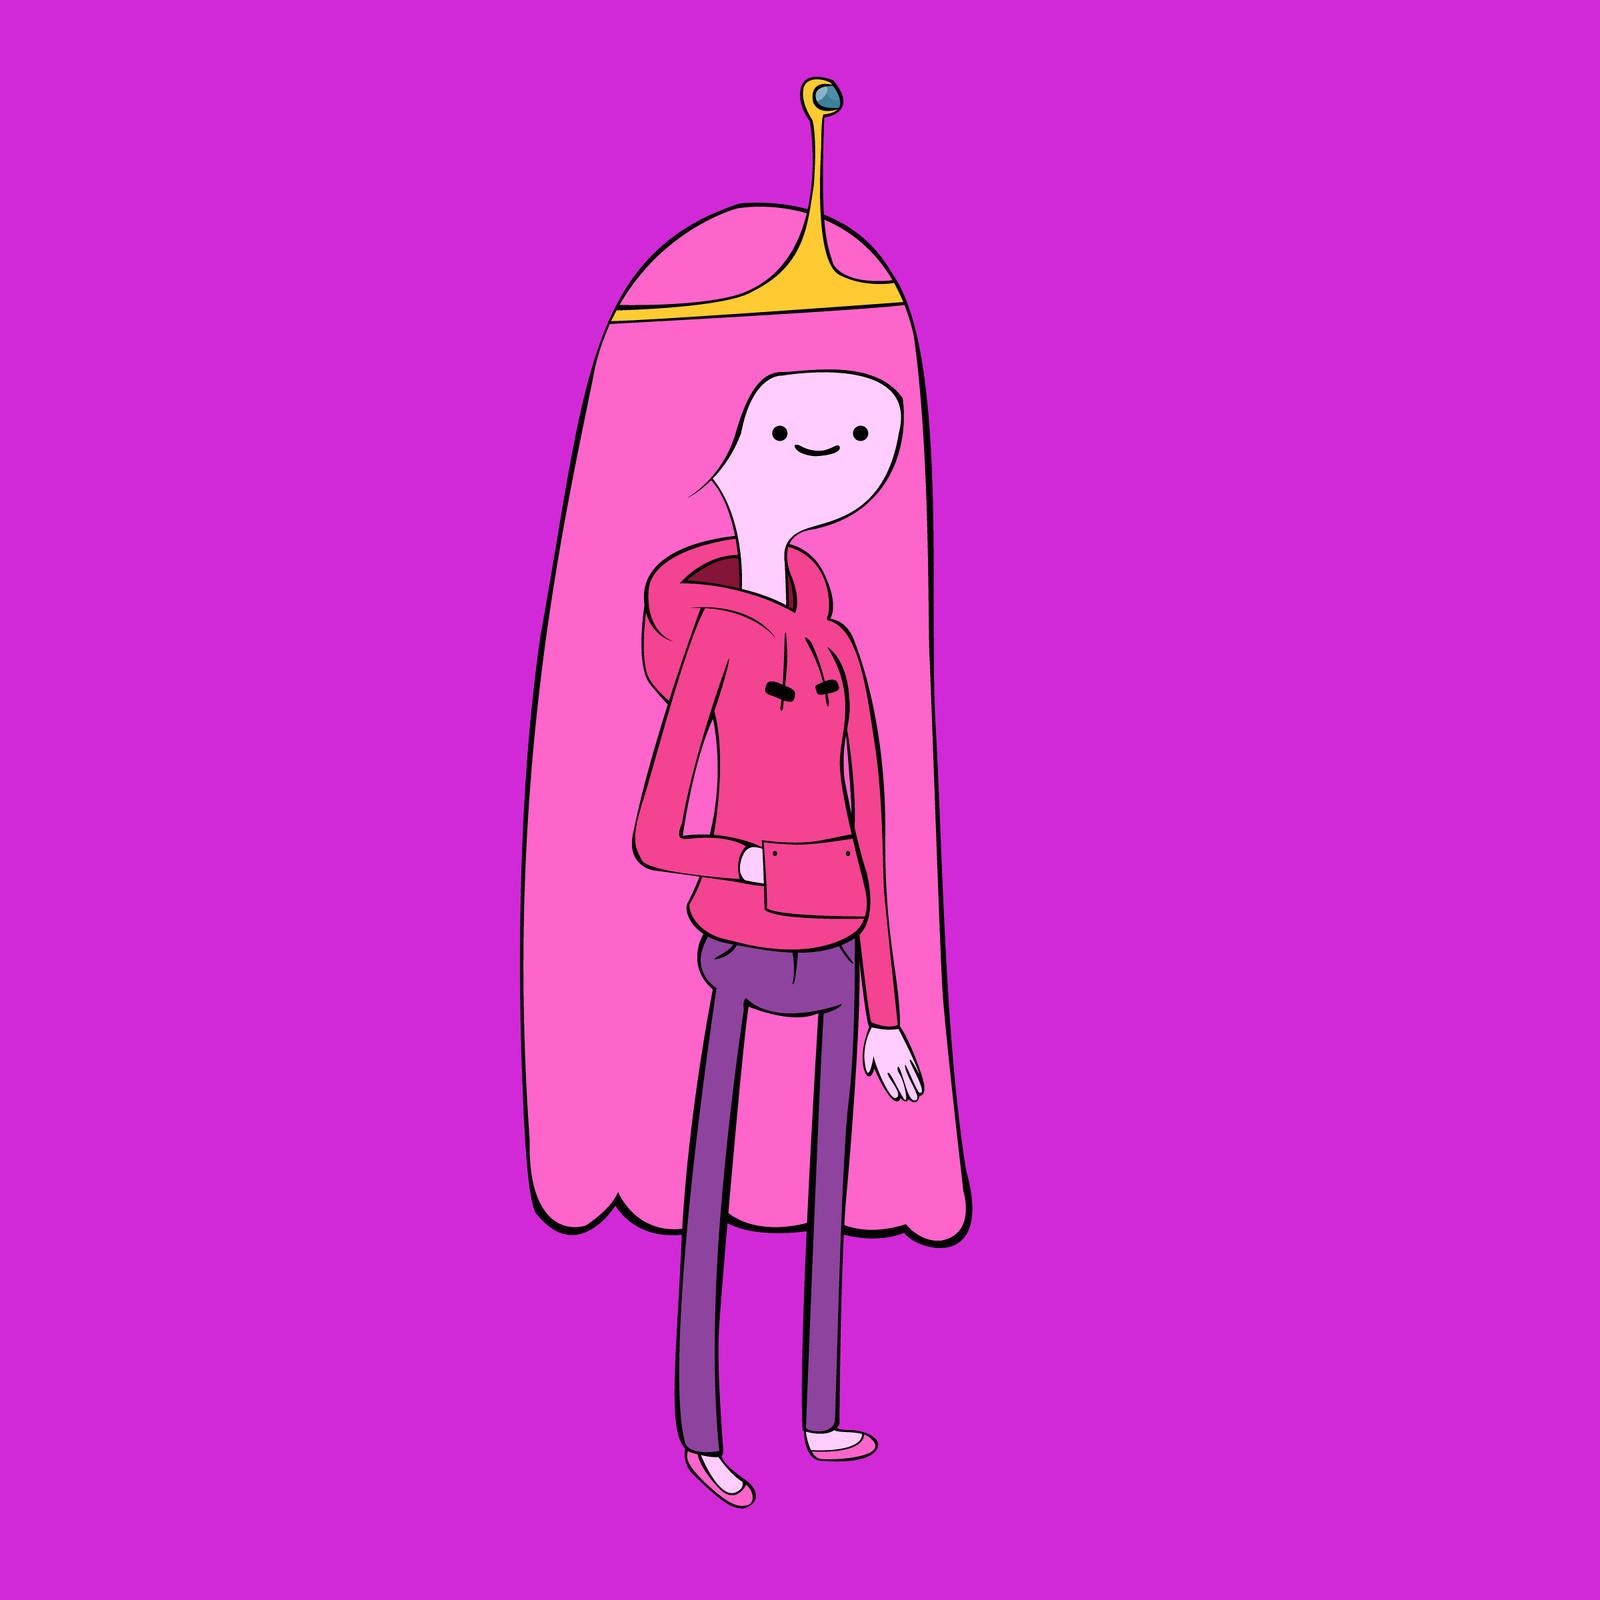 Adventure Time Princess Bubblegum by Fallen6784 on DeviantArt